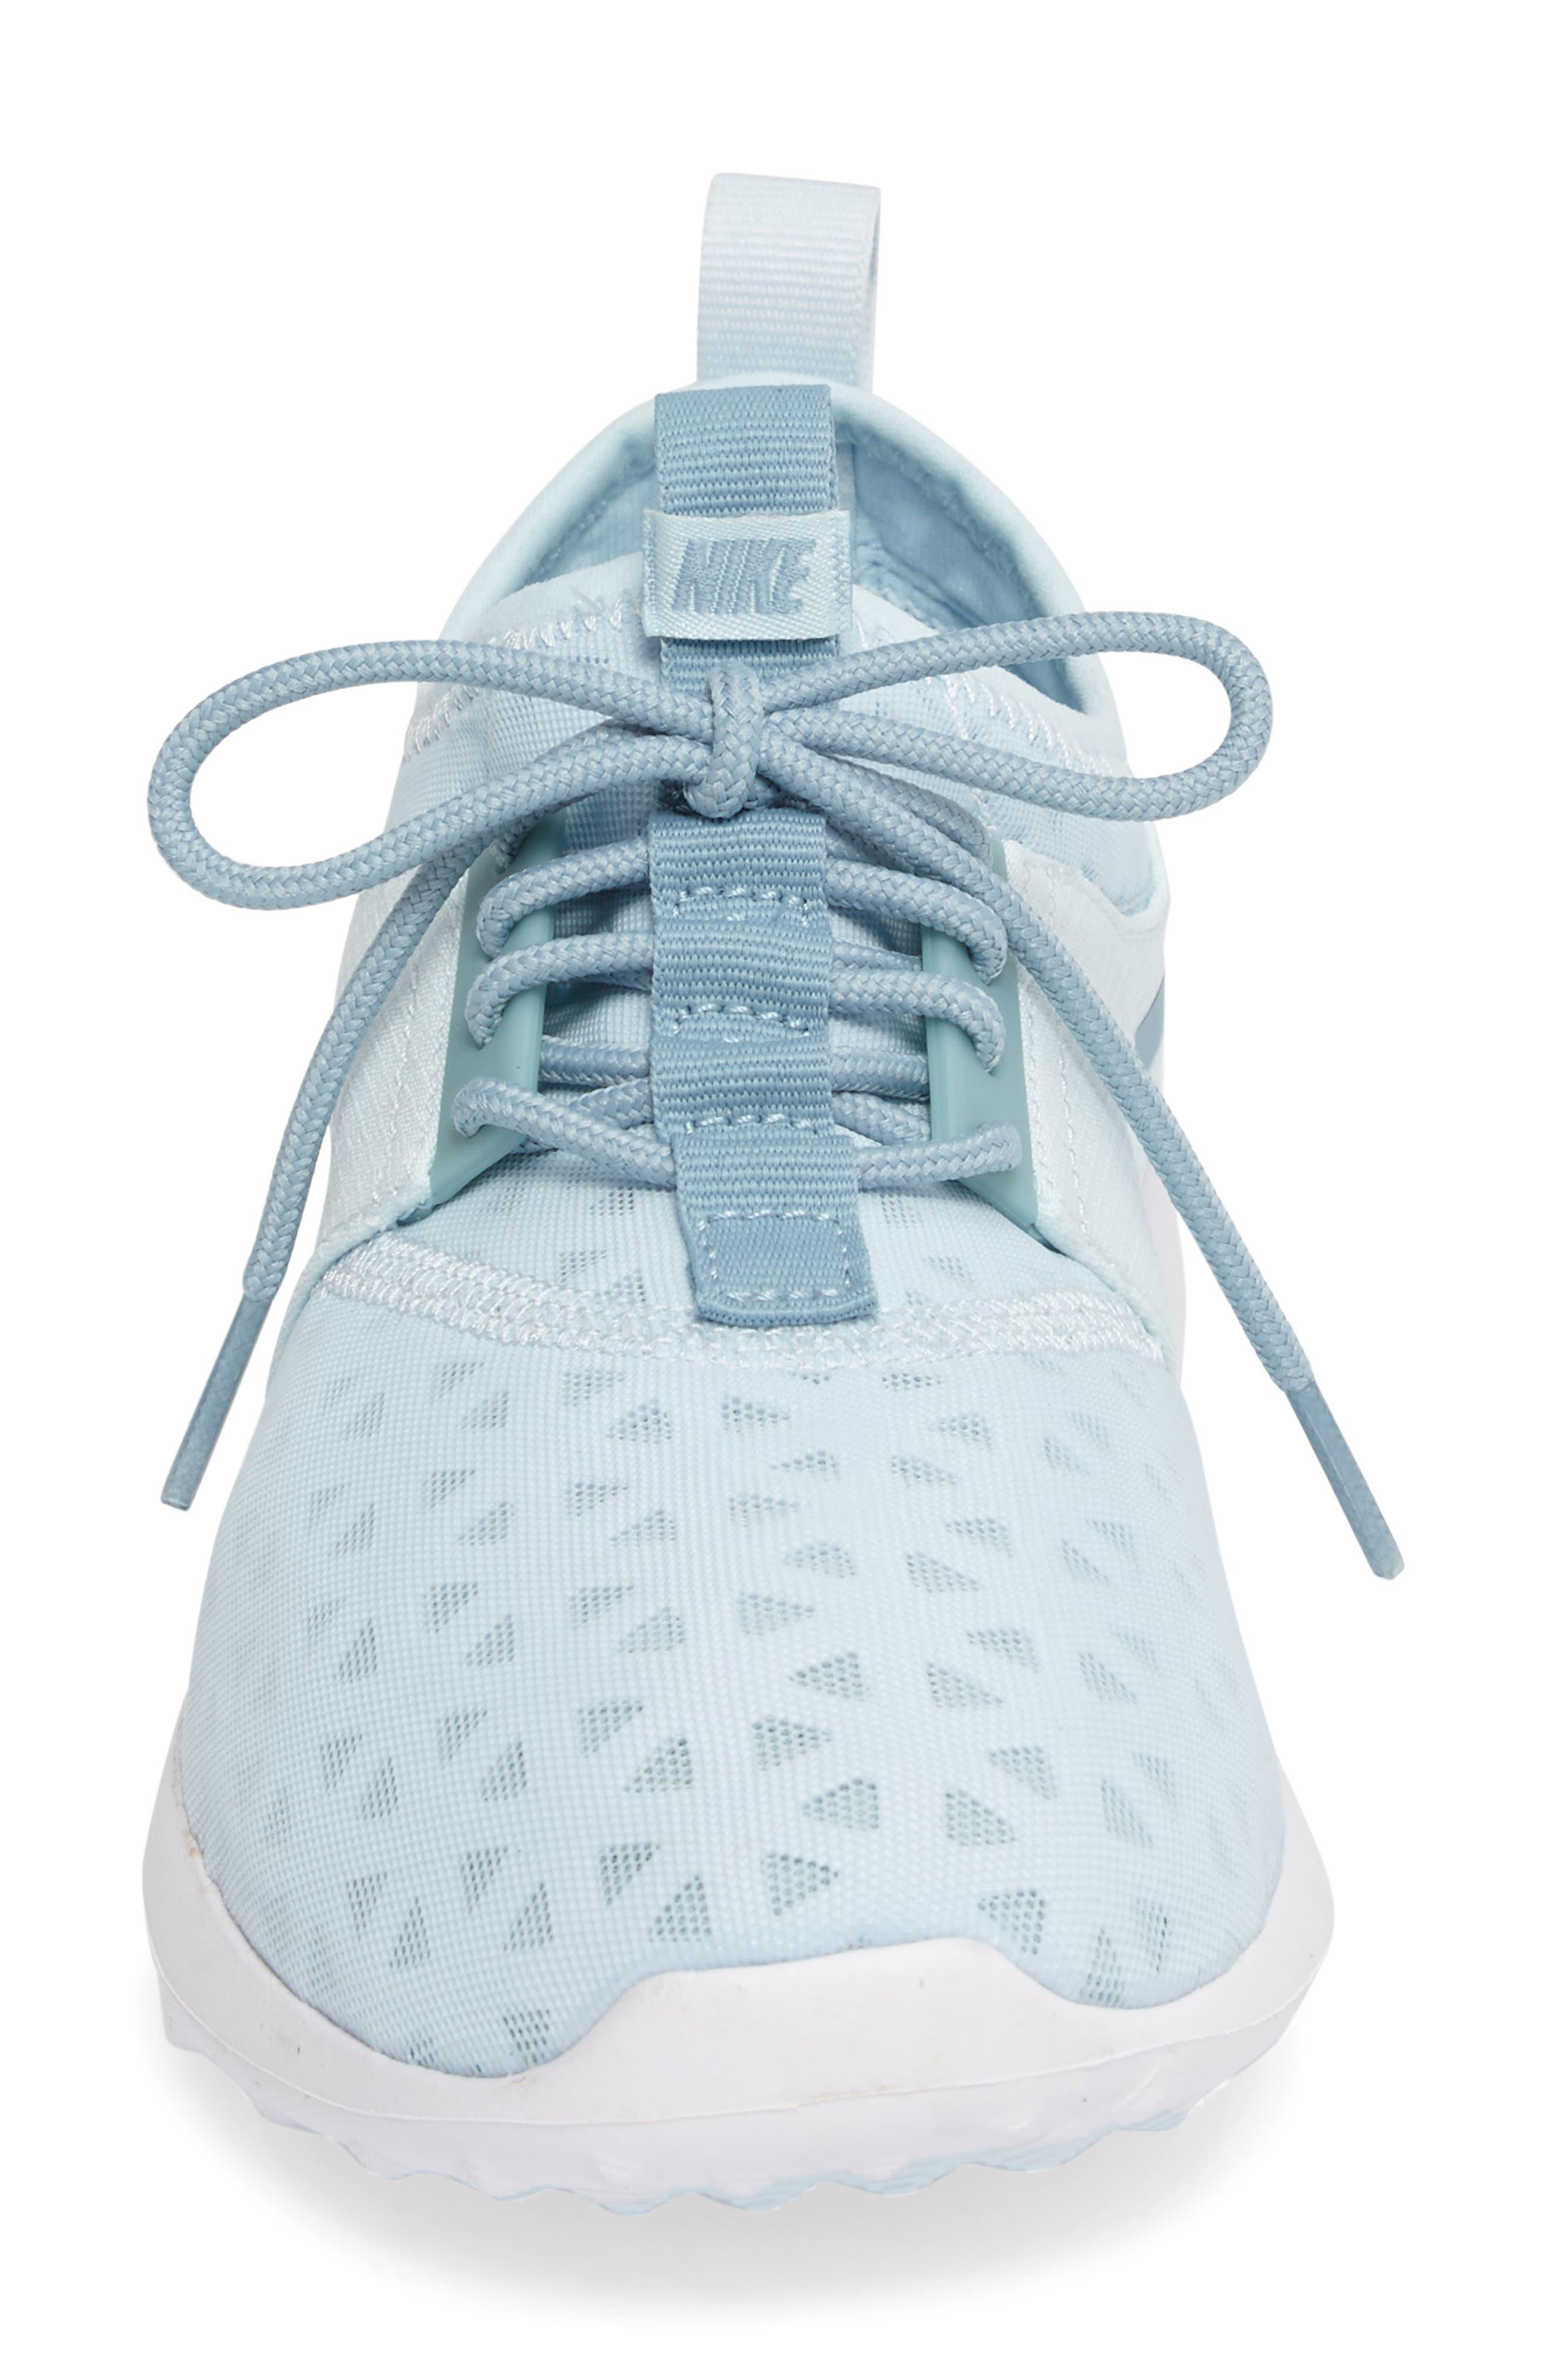 Juvenate Sneaker,                             Alternate thumbnail 195, color,